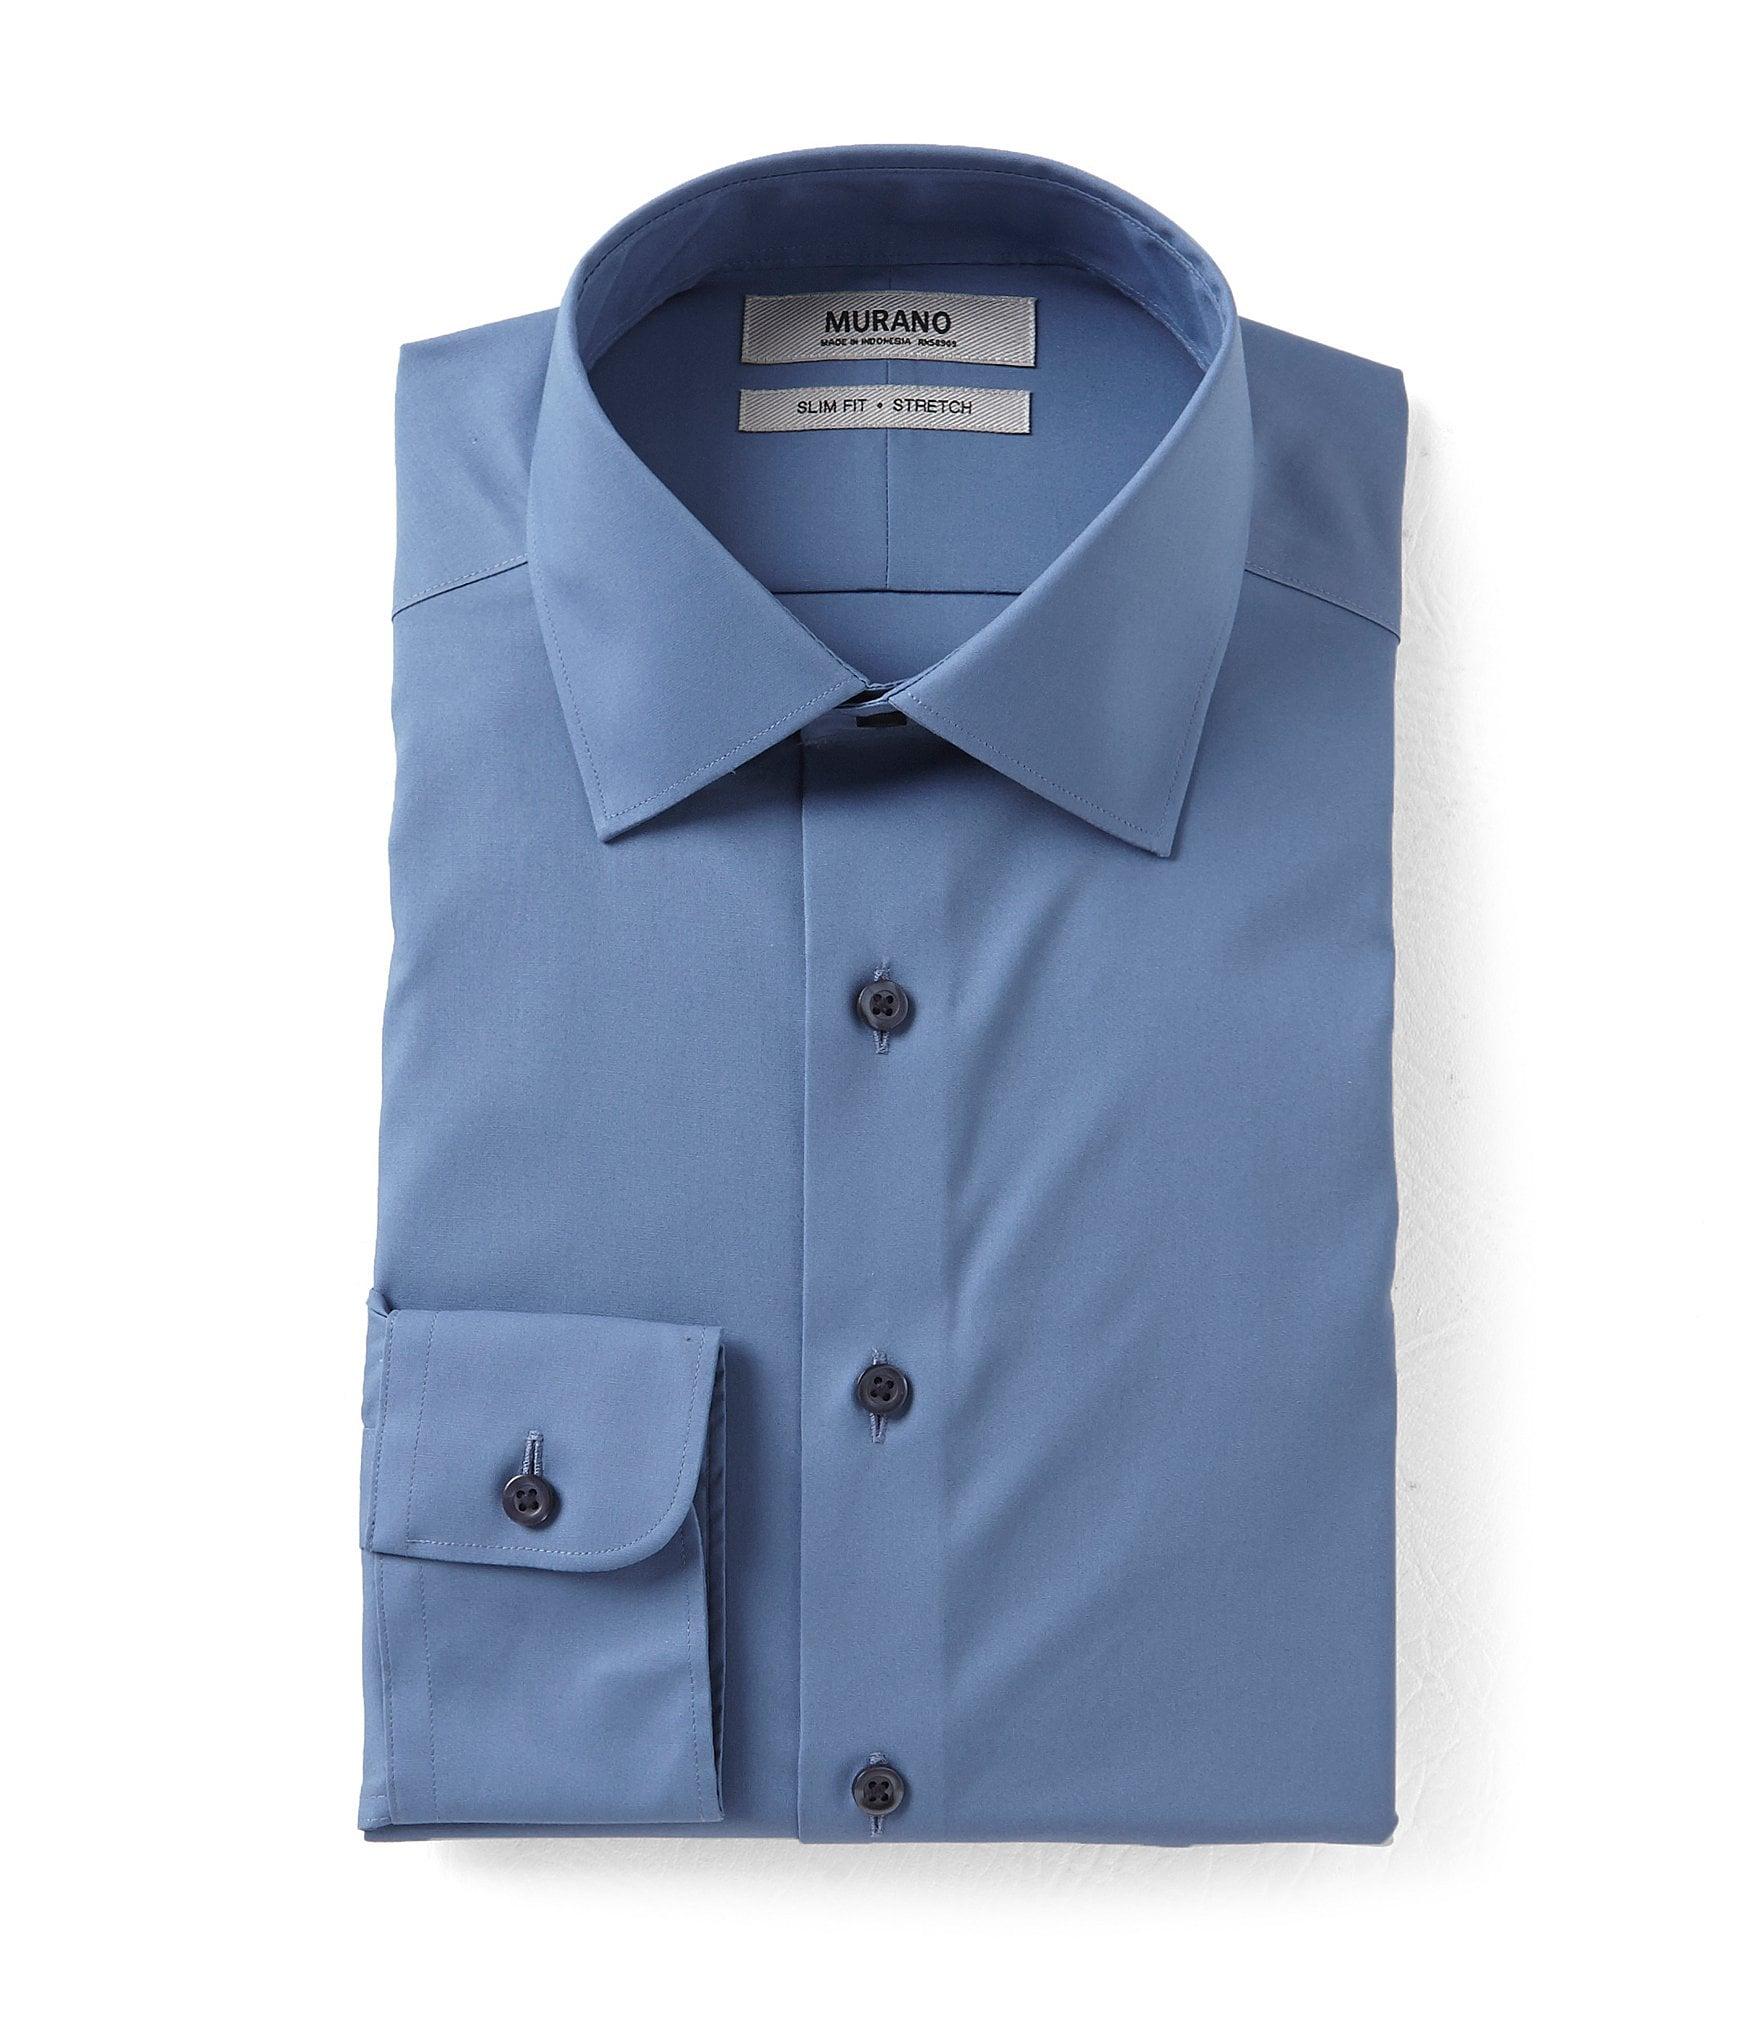 Murano slim fit spread collar dress shirt dillards for Dress shirt collar fit